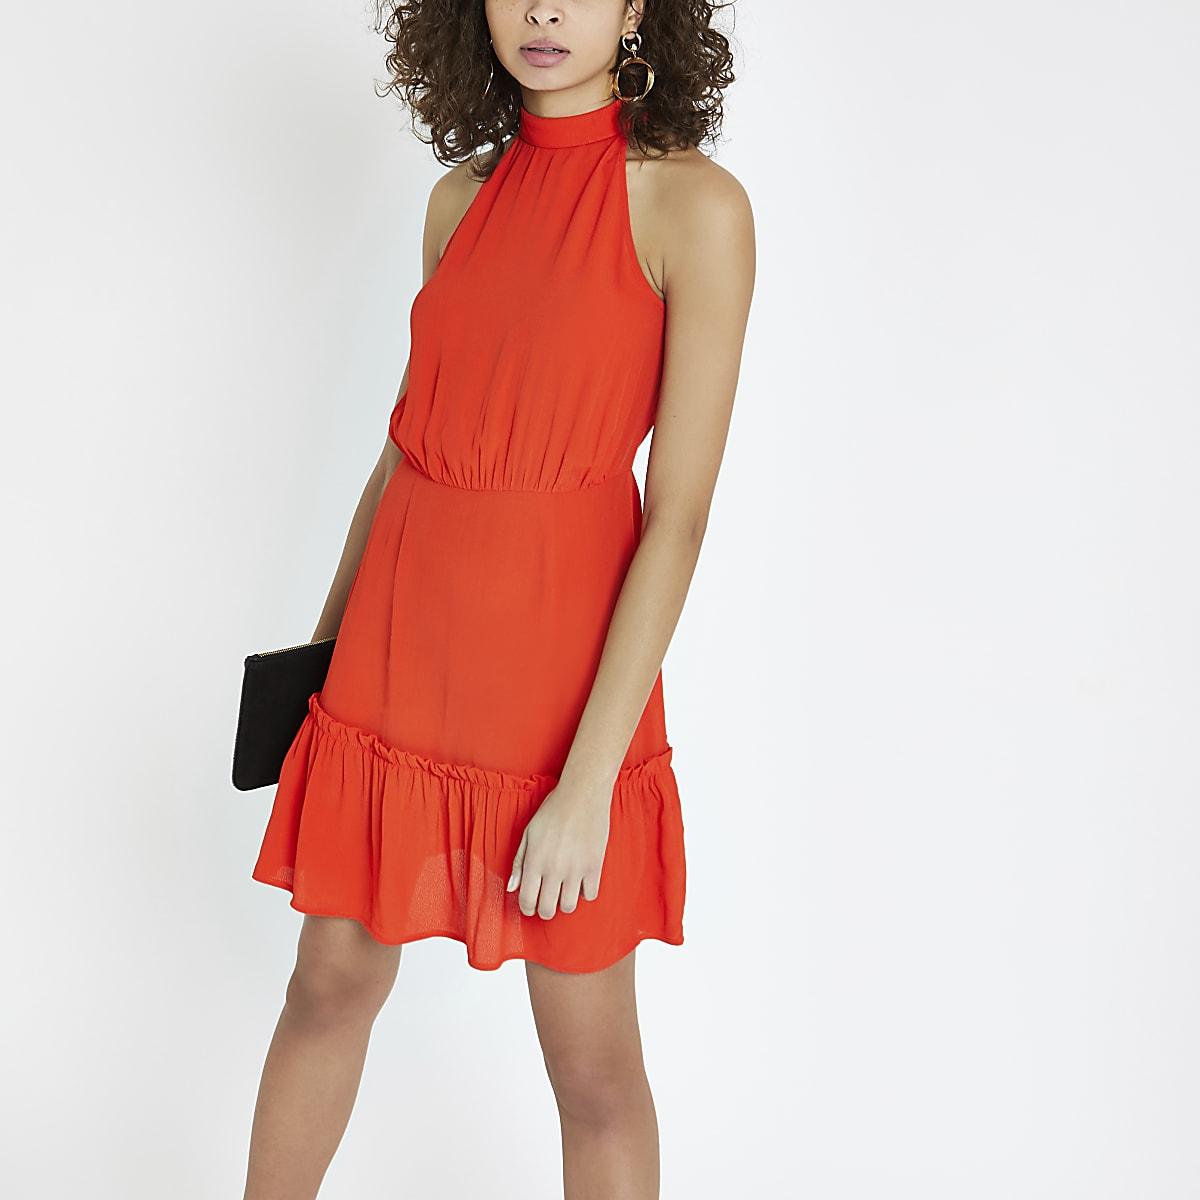 Red high tie neck swing dress